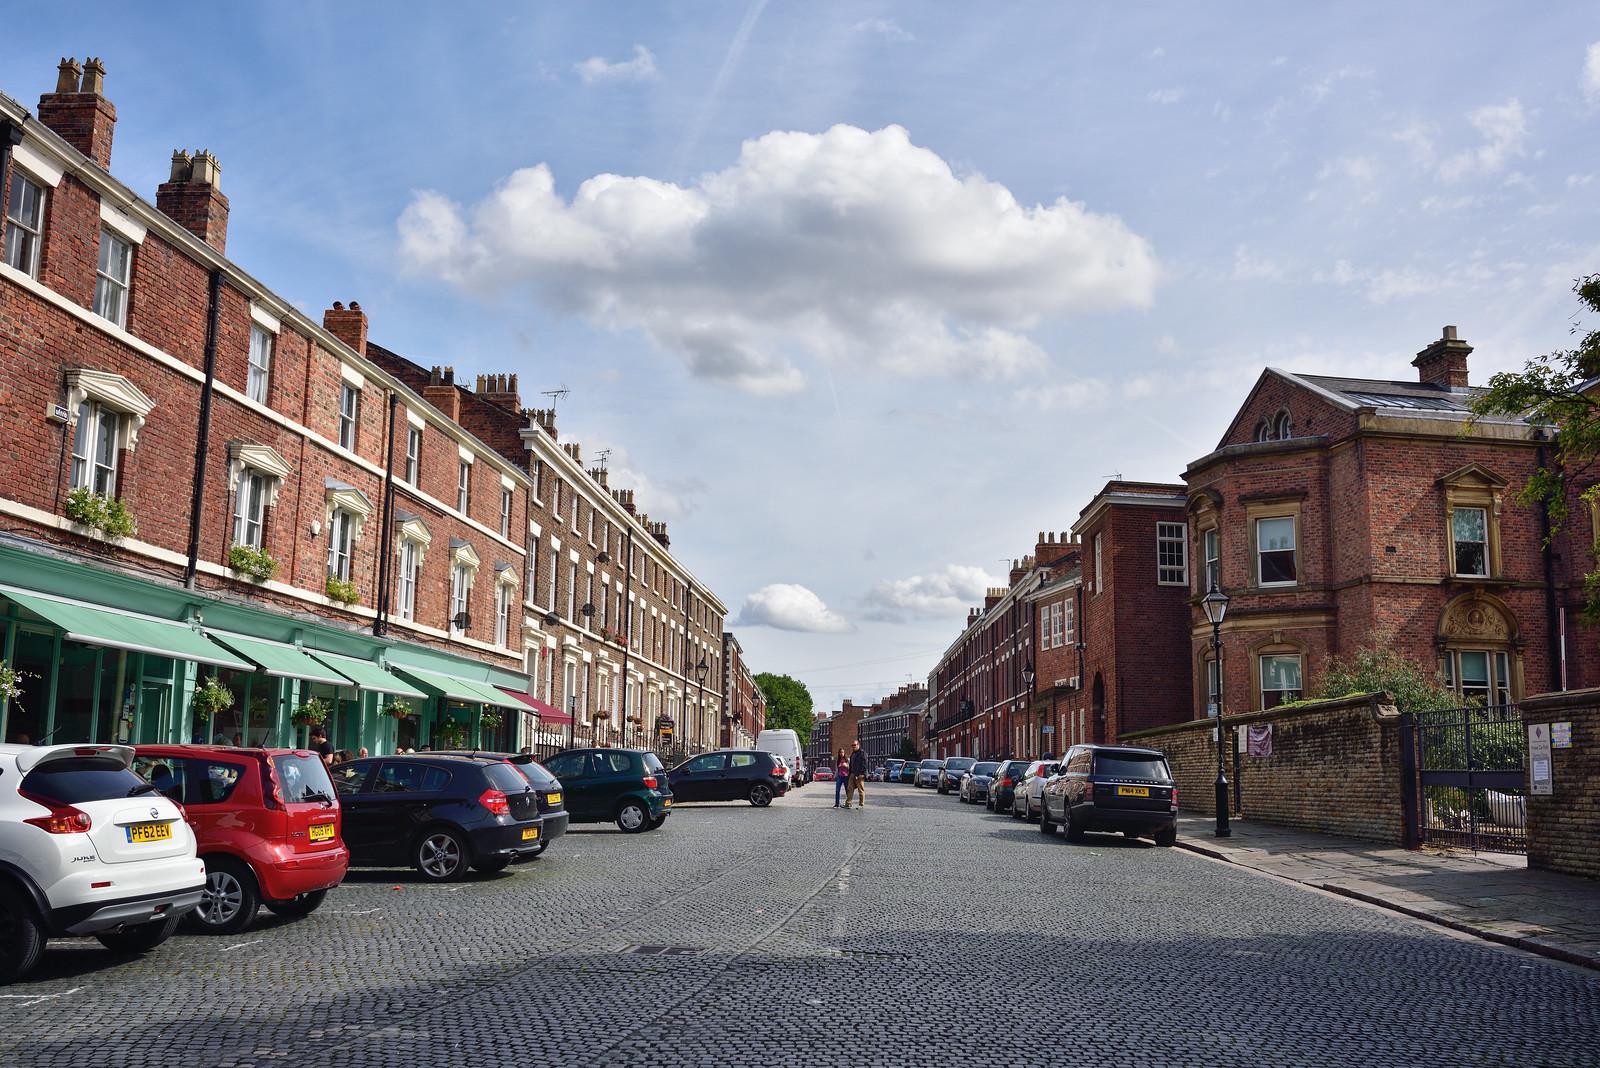 Falkner Street